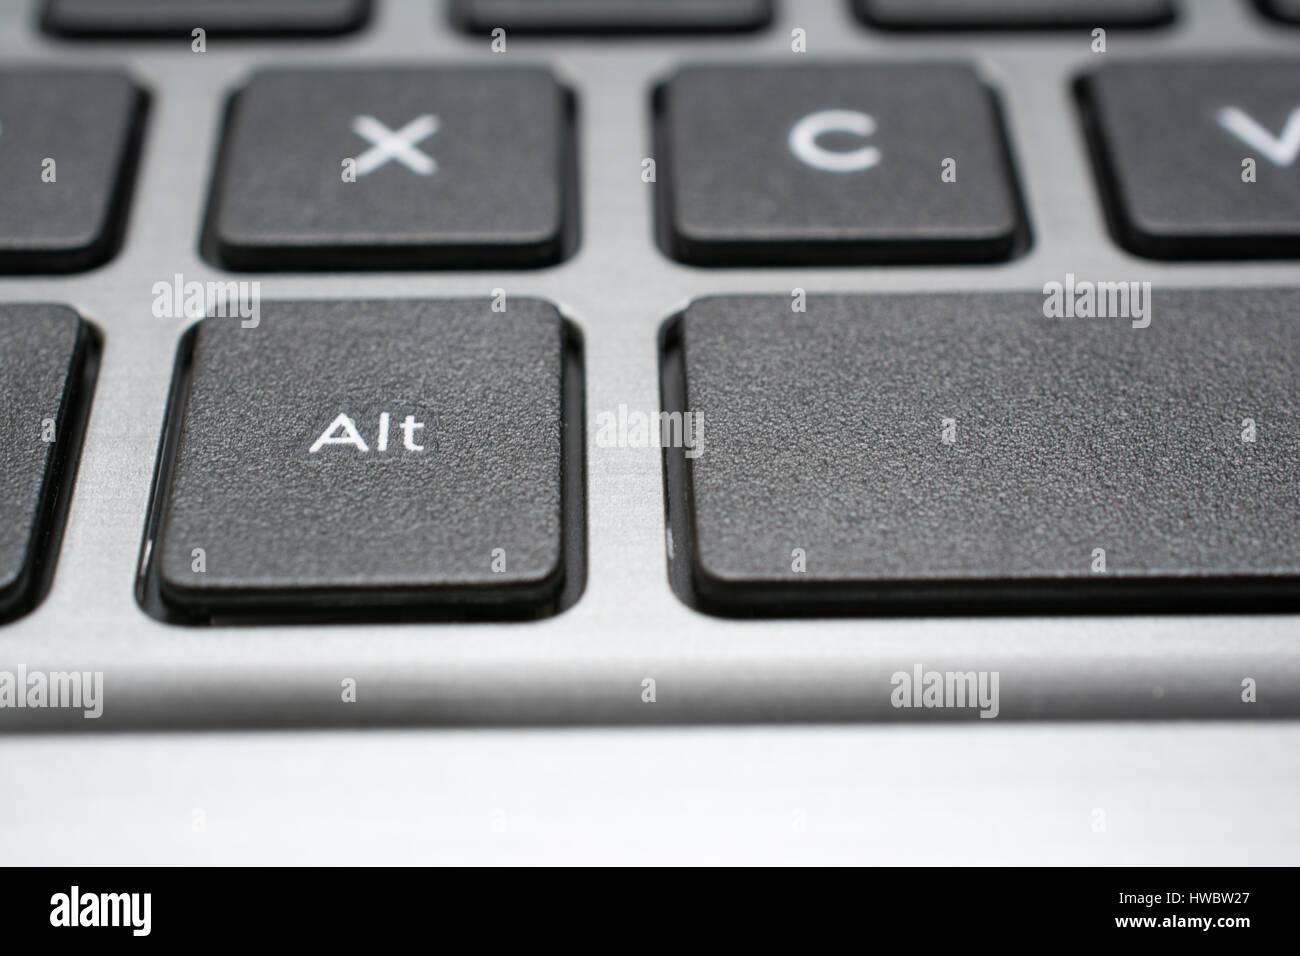 Moderne Laptop Tastatur Nahaufnahme. Alt-Taste. Geringe Schärfentiefe. Stockbild